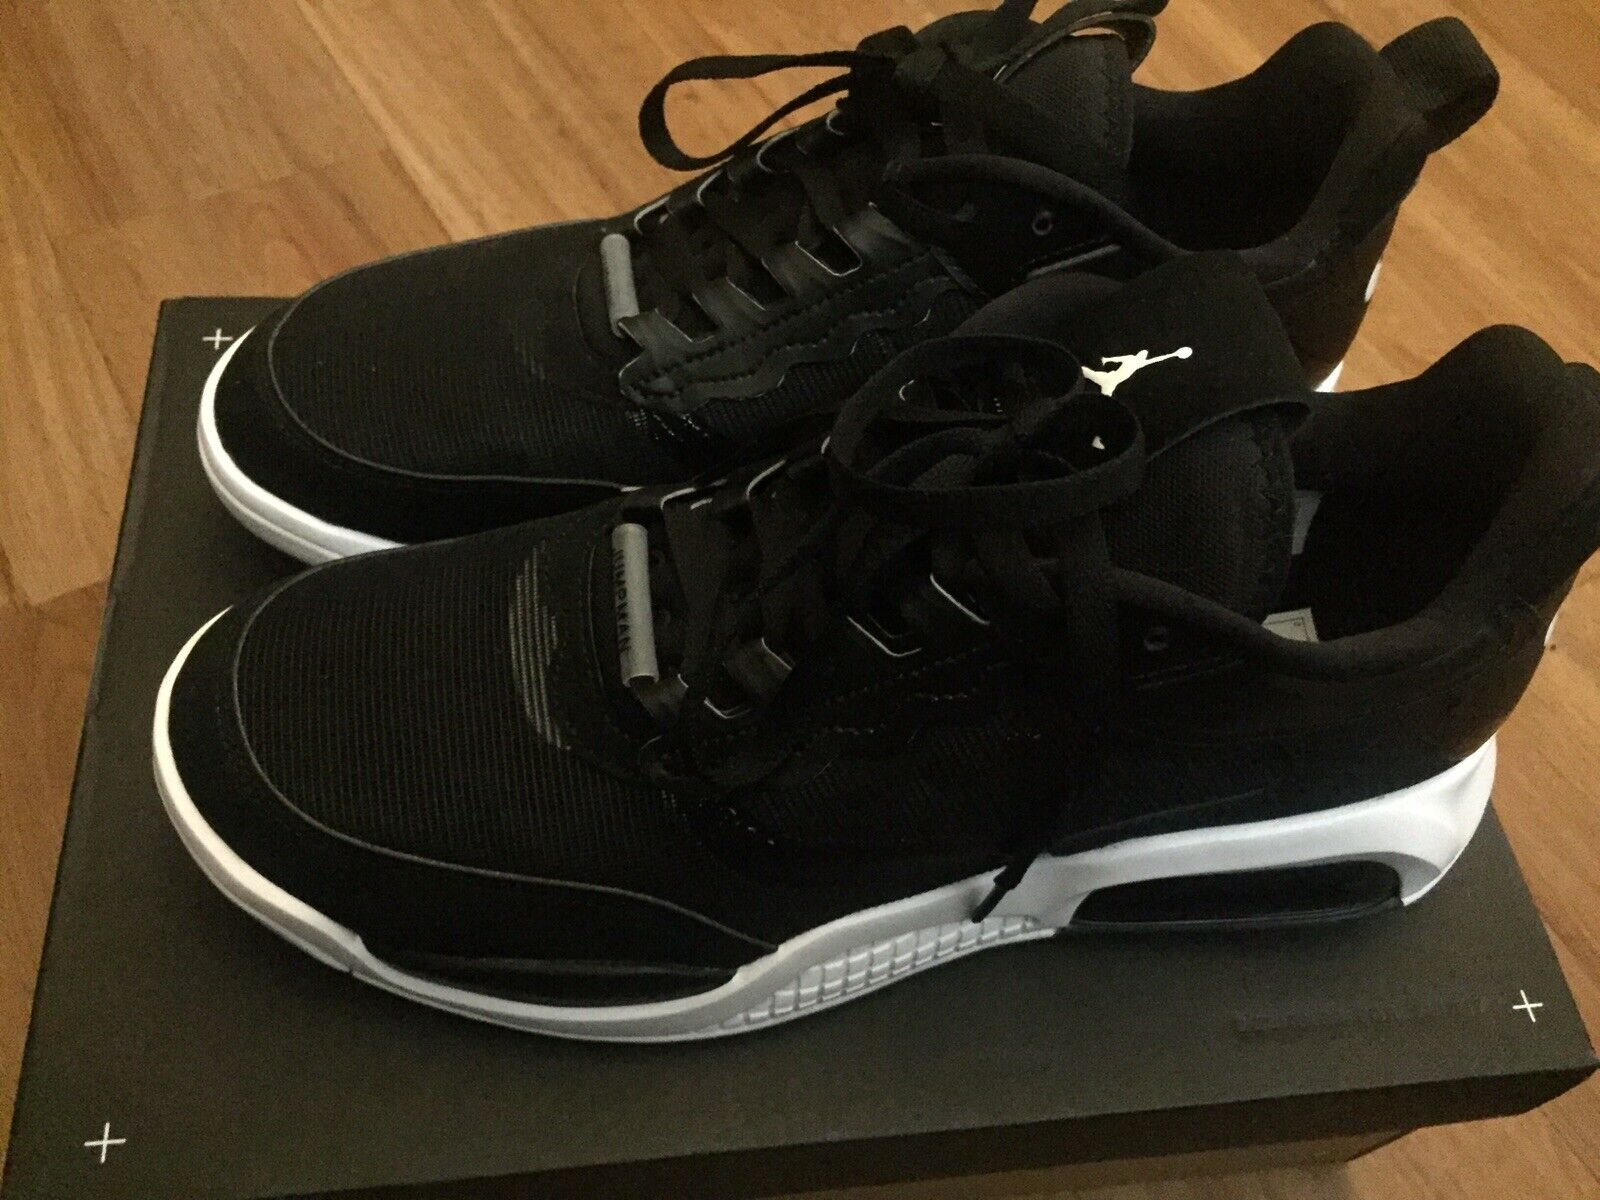 Nike Air Jordan Max 200. Black/White. New with Box Size 9.5